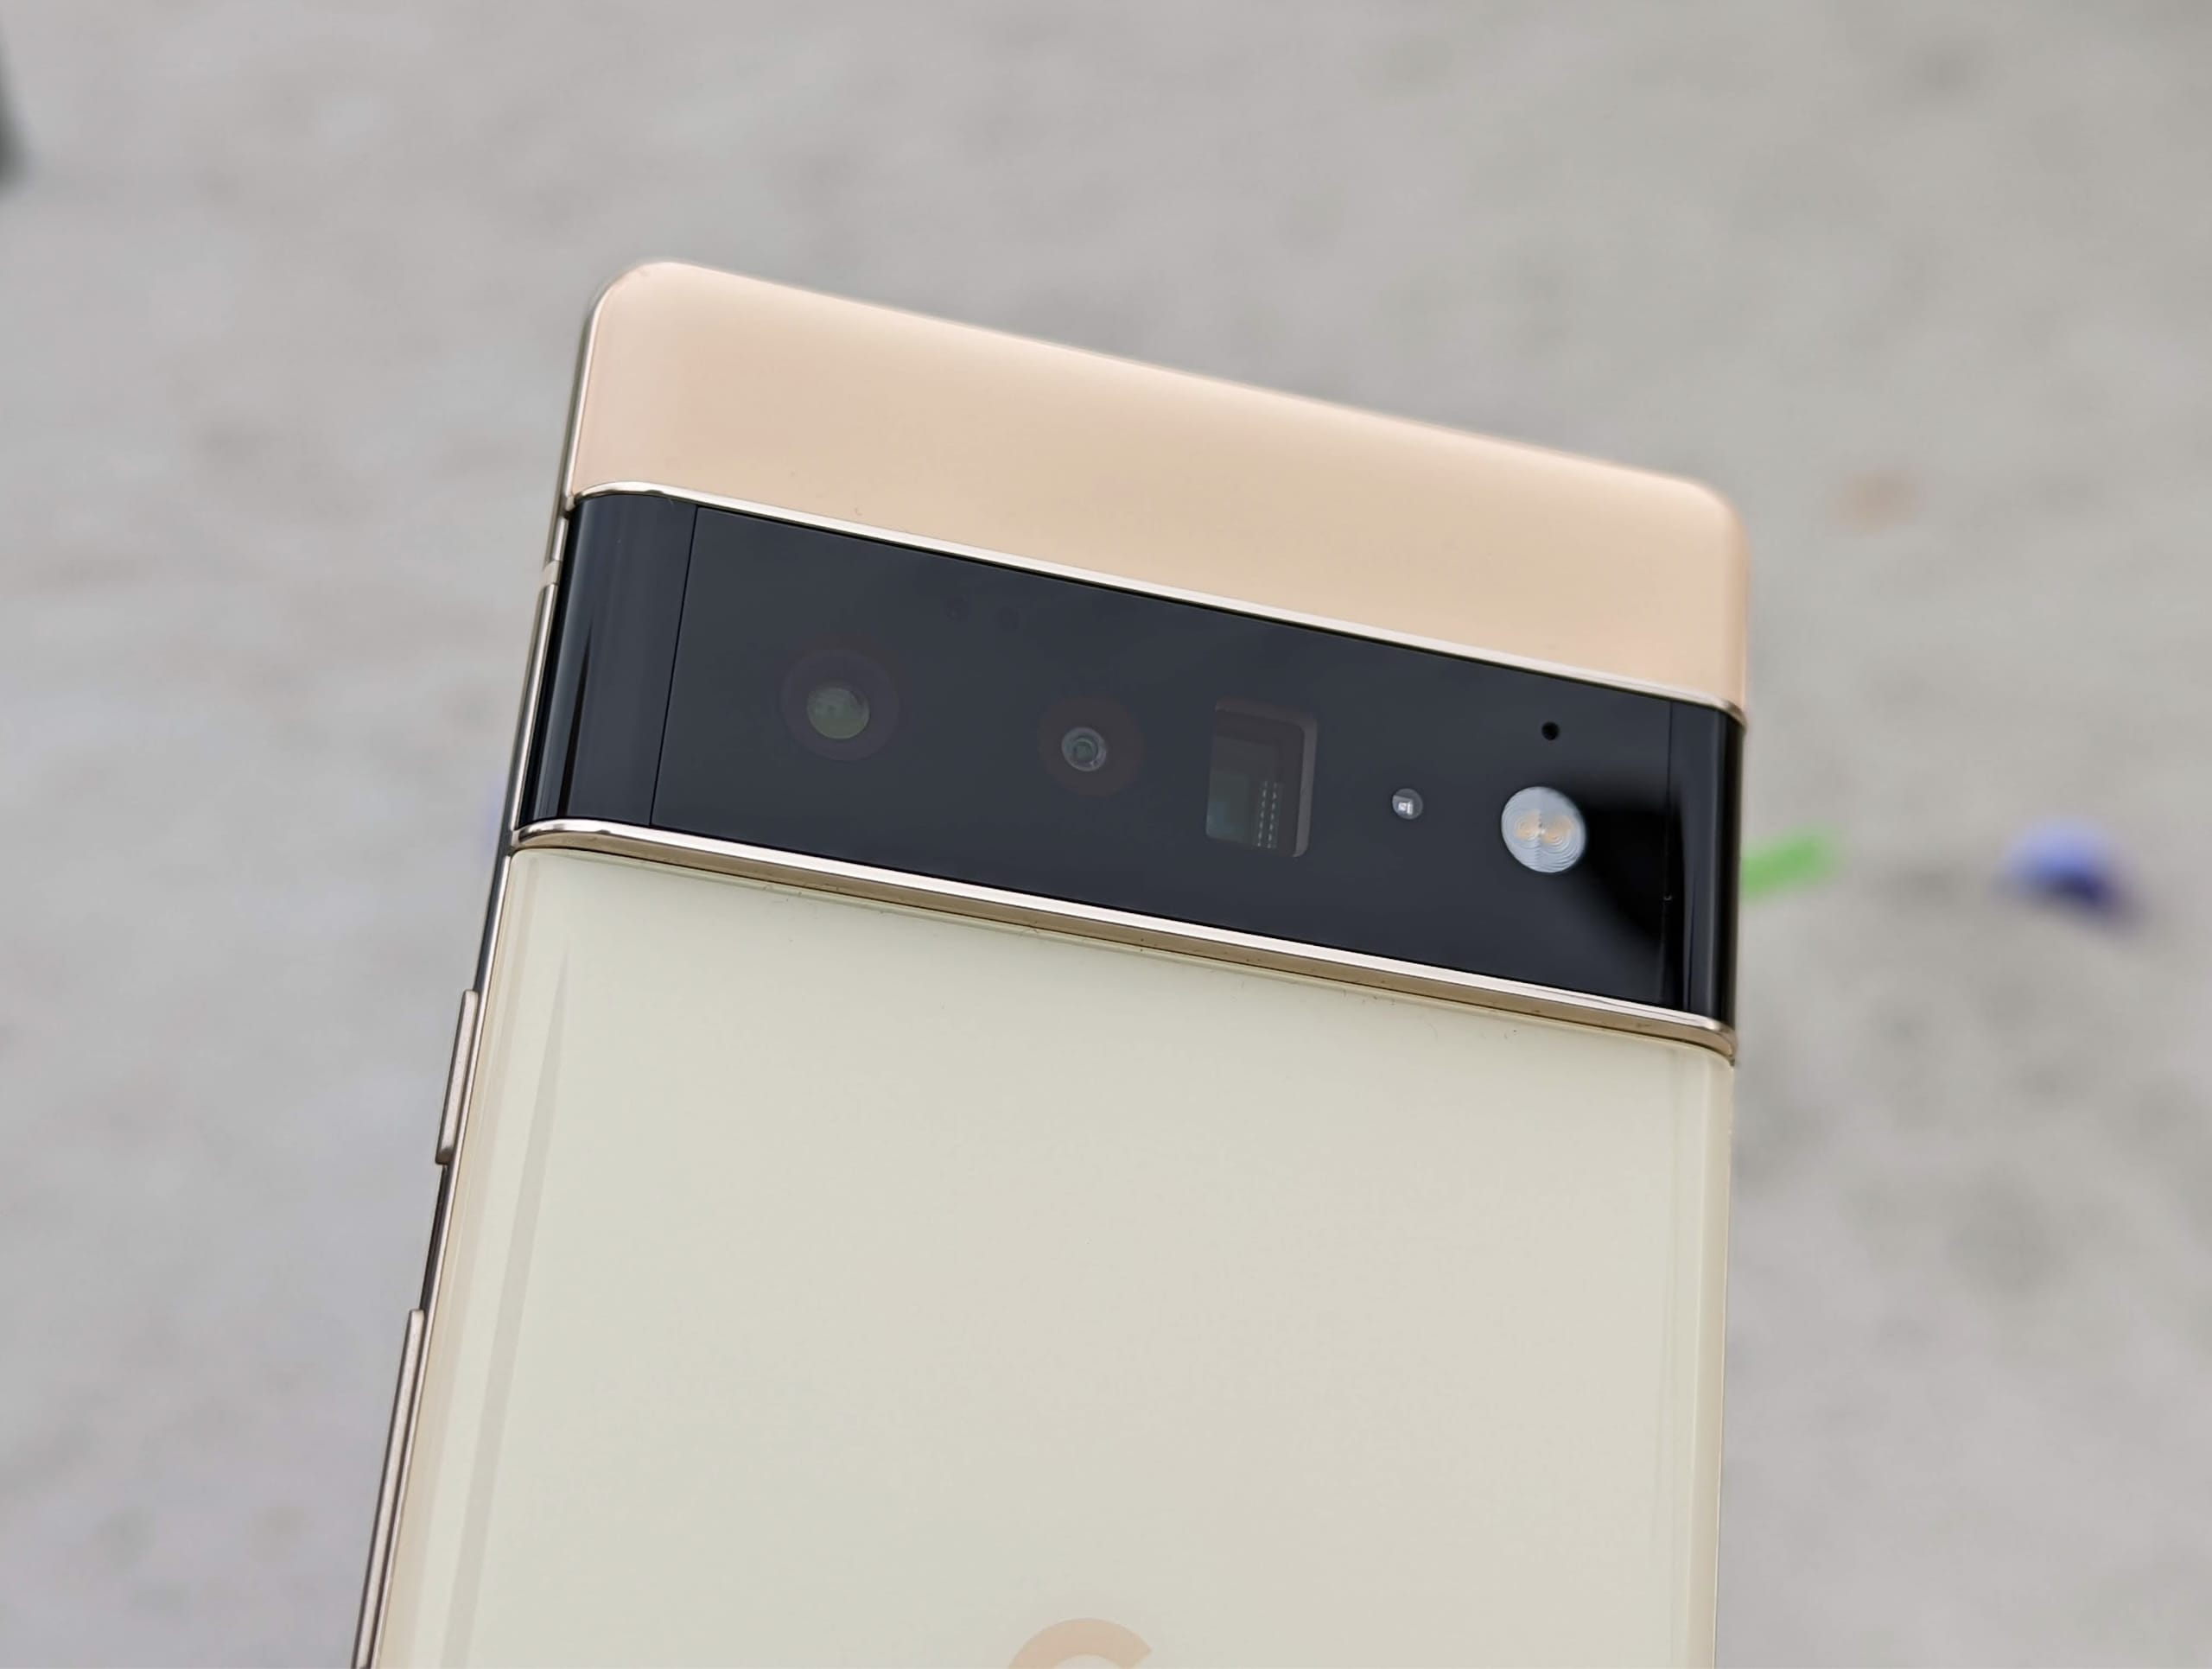 Google Pixel 6 Pro Kameratest: 40+ Fotos direkt aus der Triple-Cam